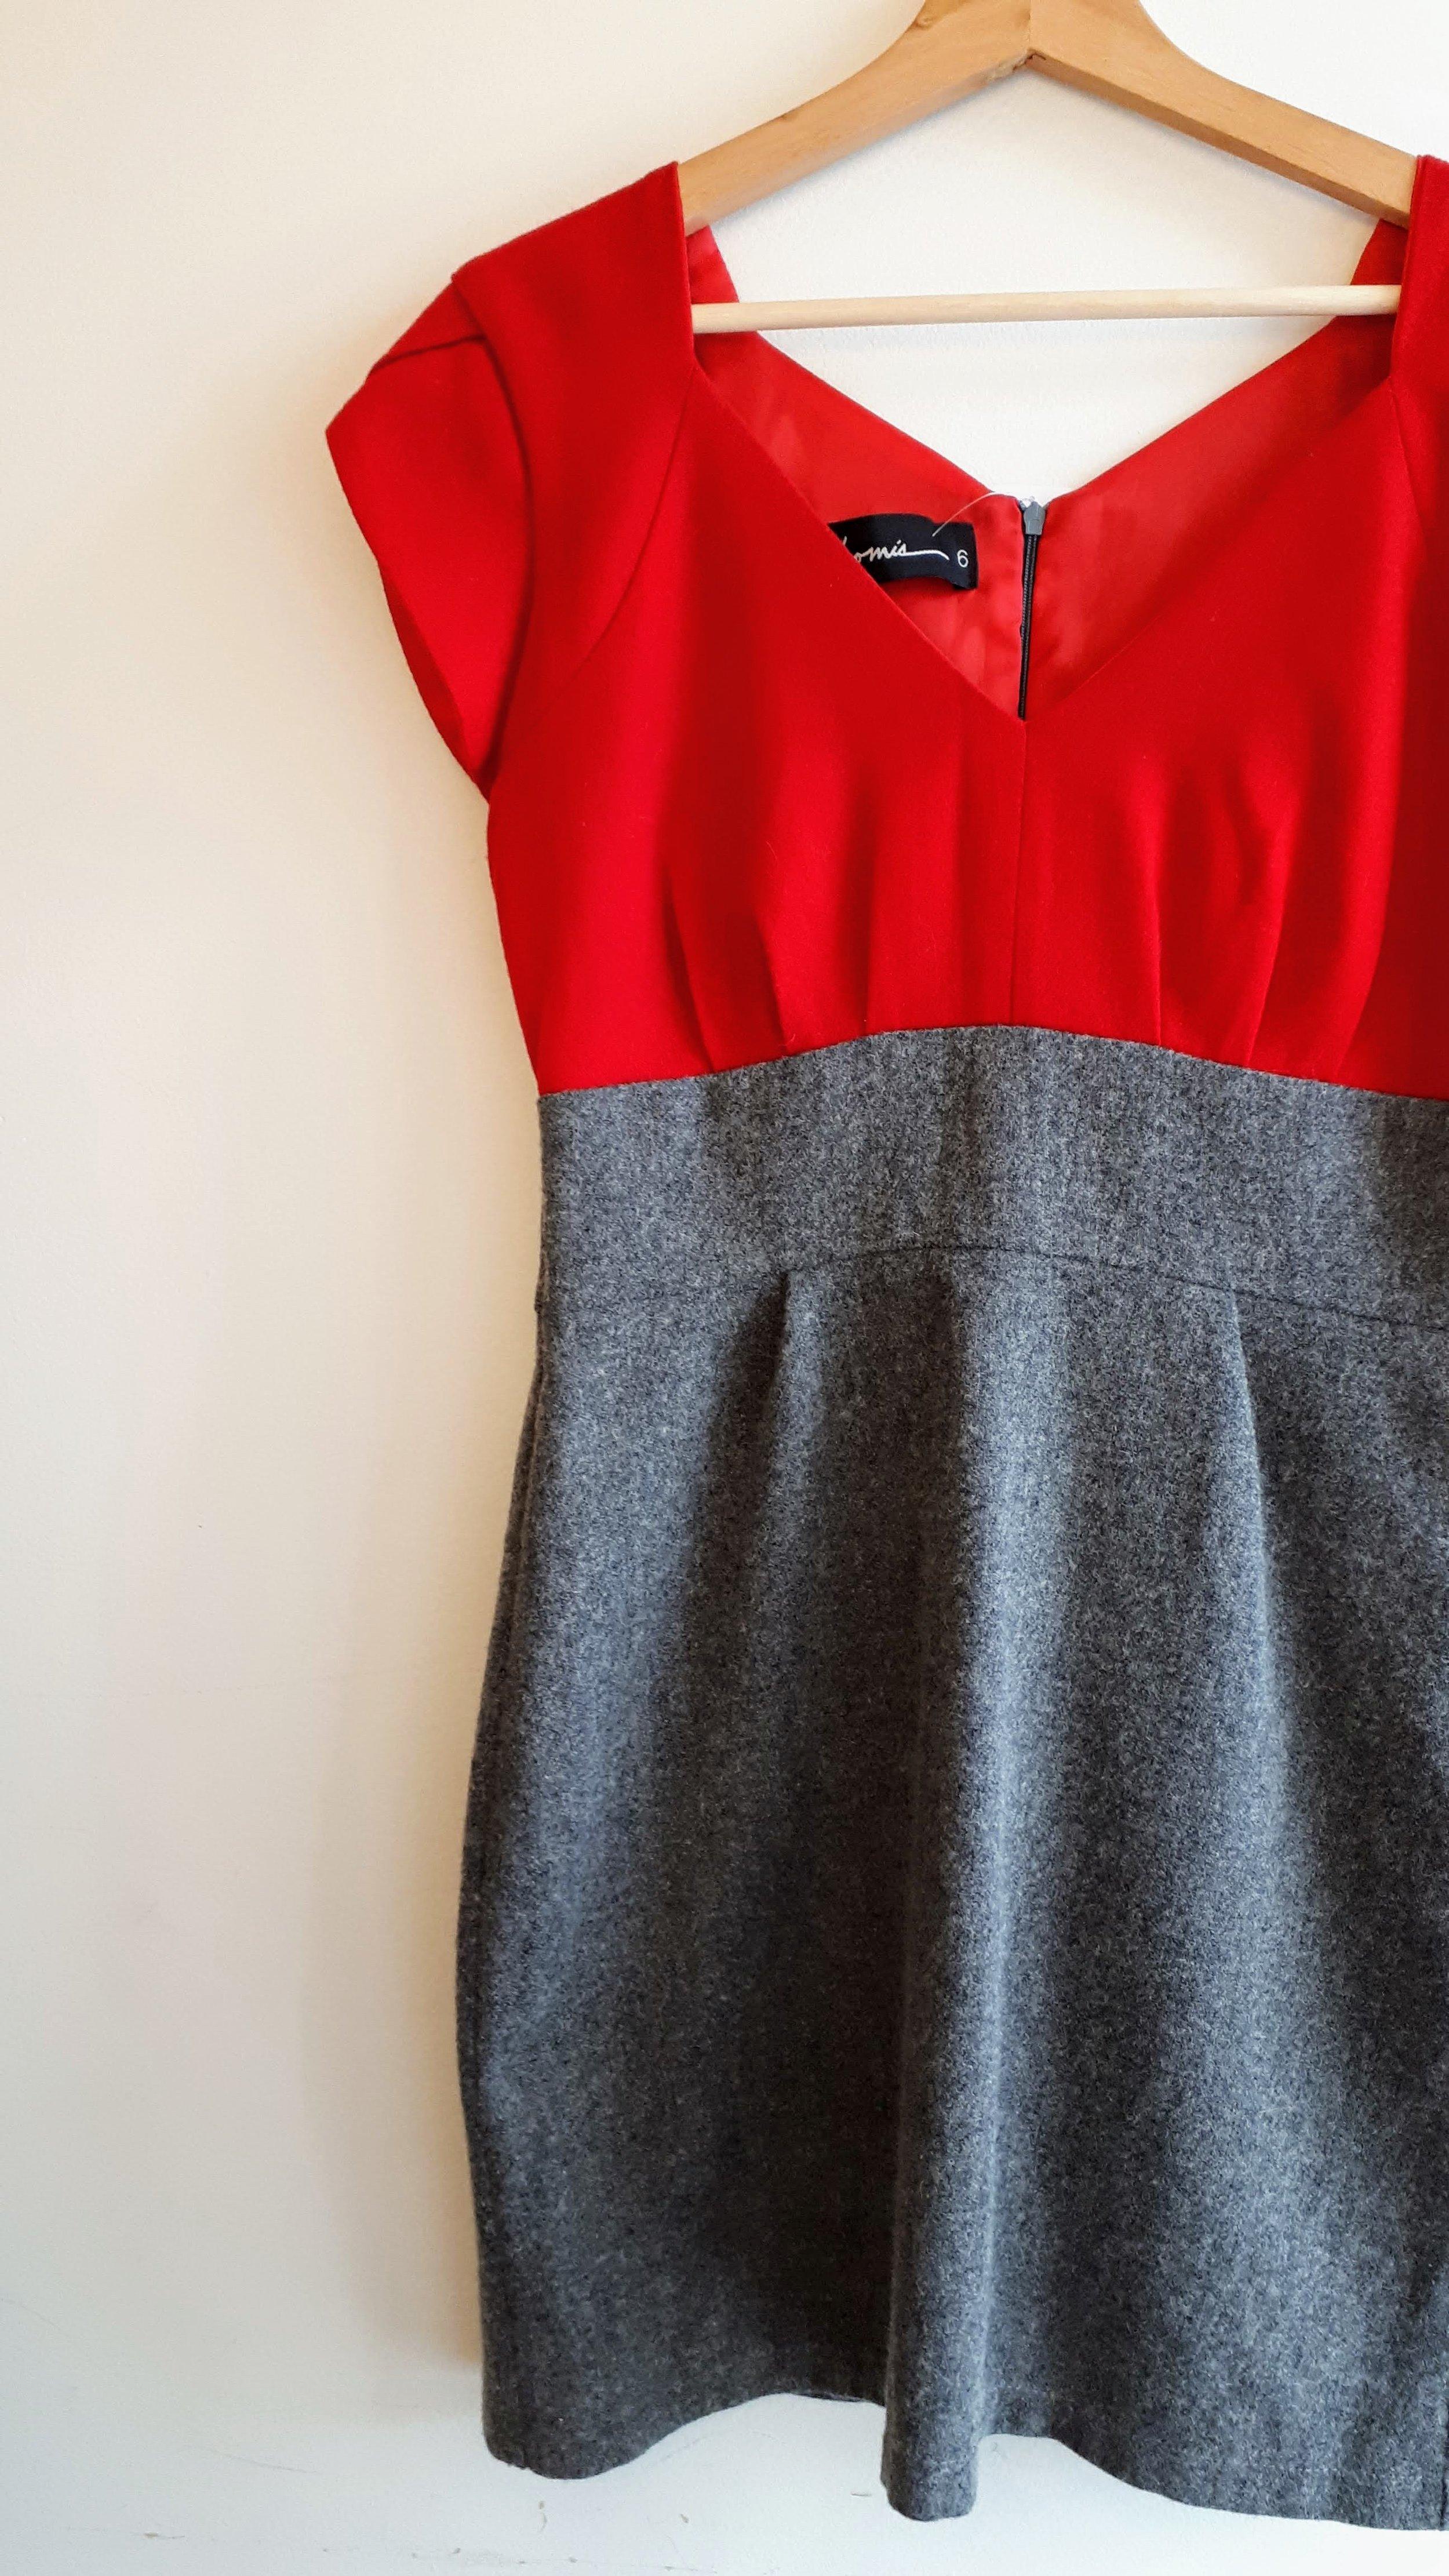 Nokomis dress; Size 6, $48